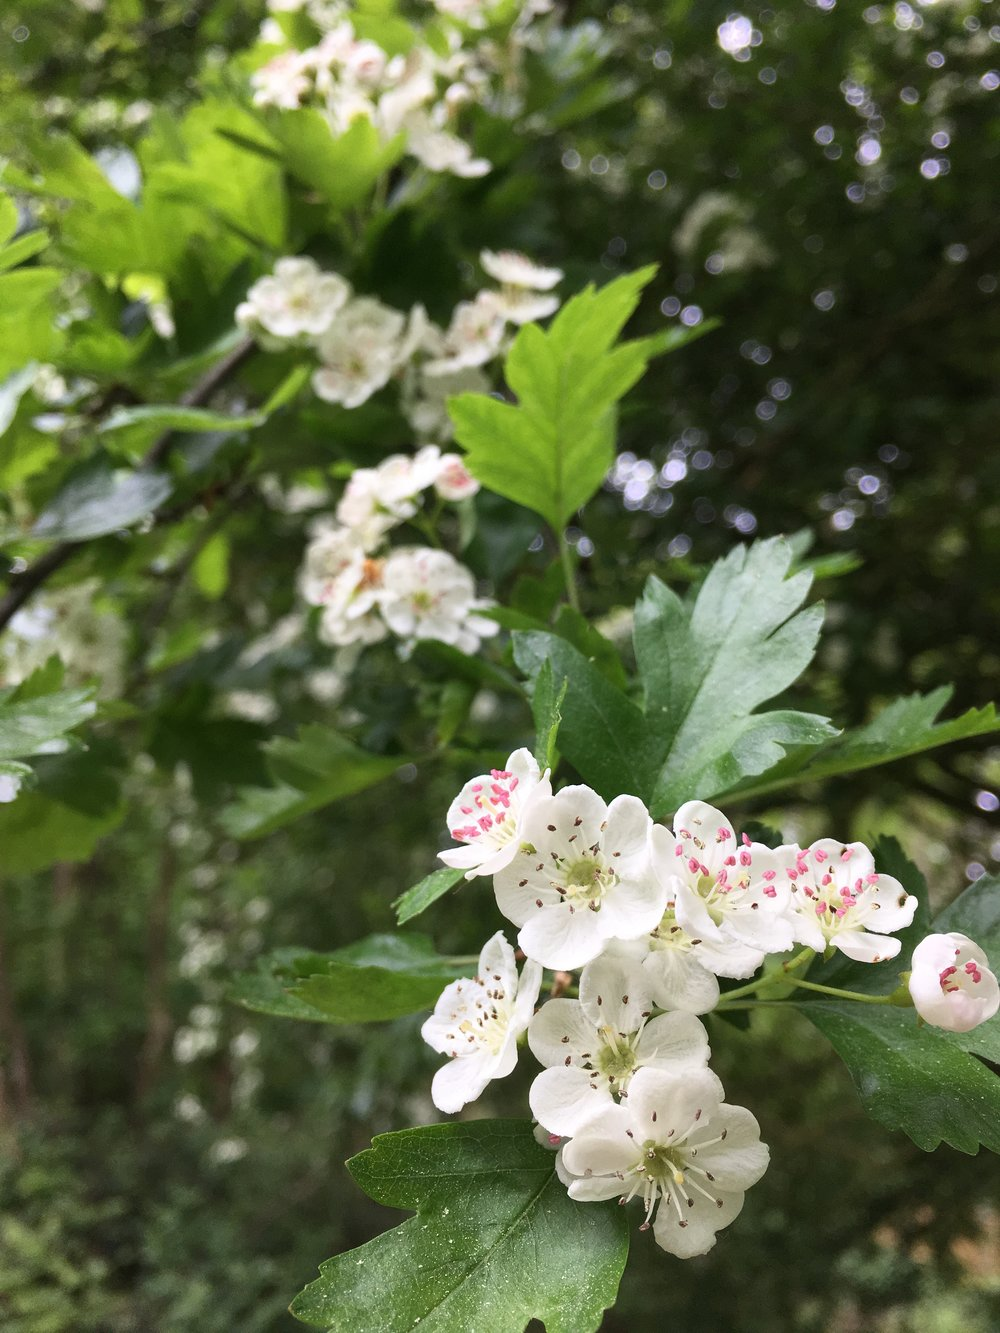 hawthorn blossom.JPG